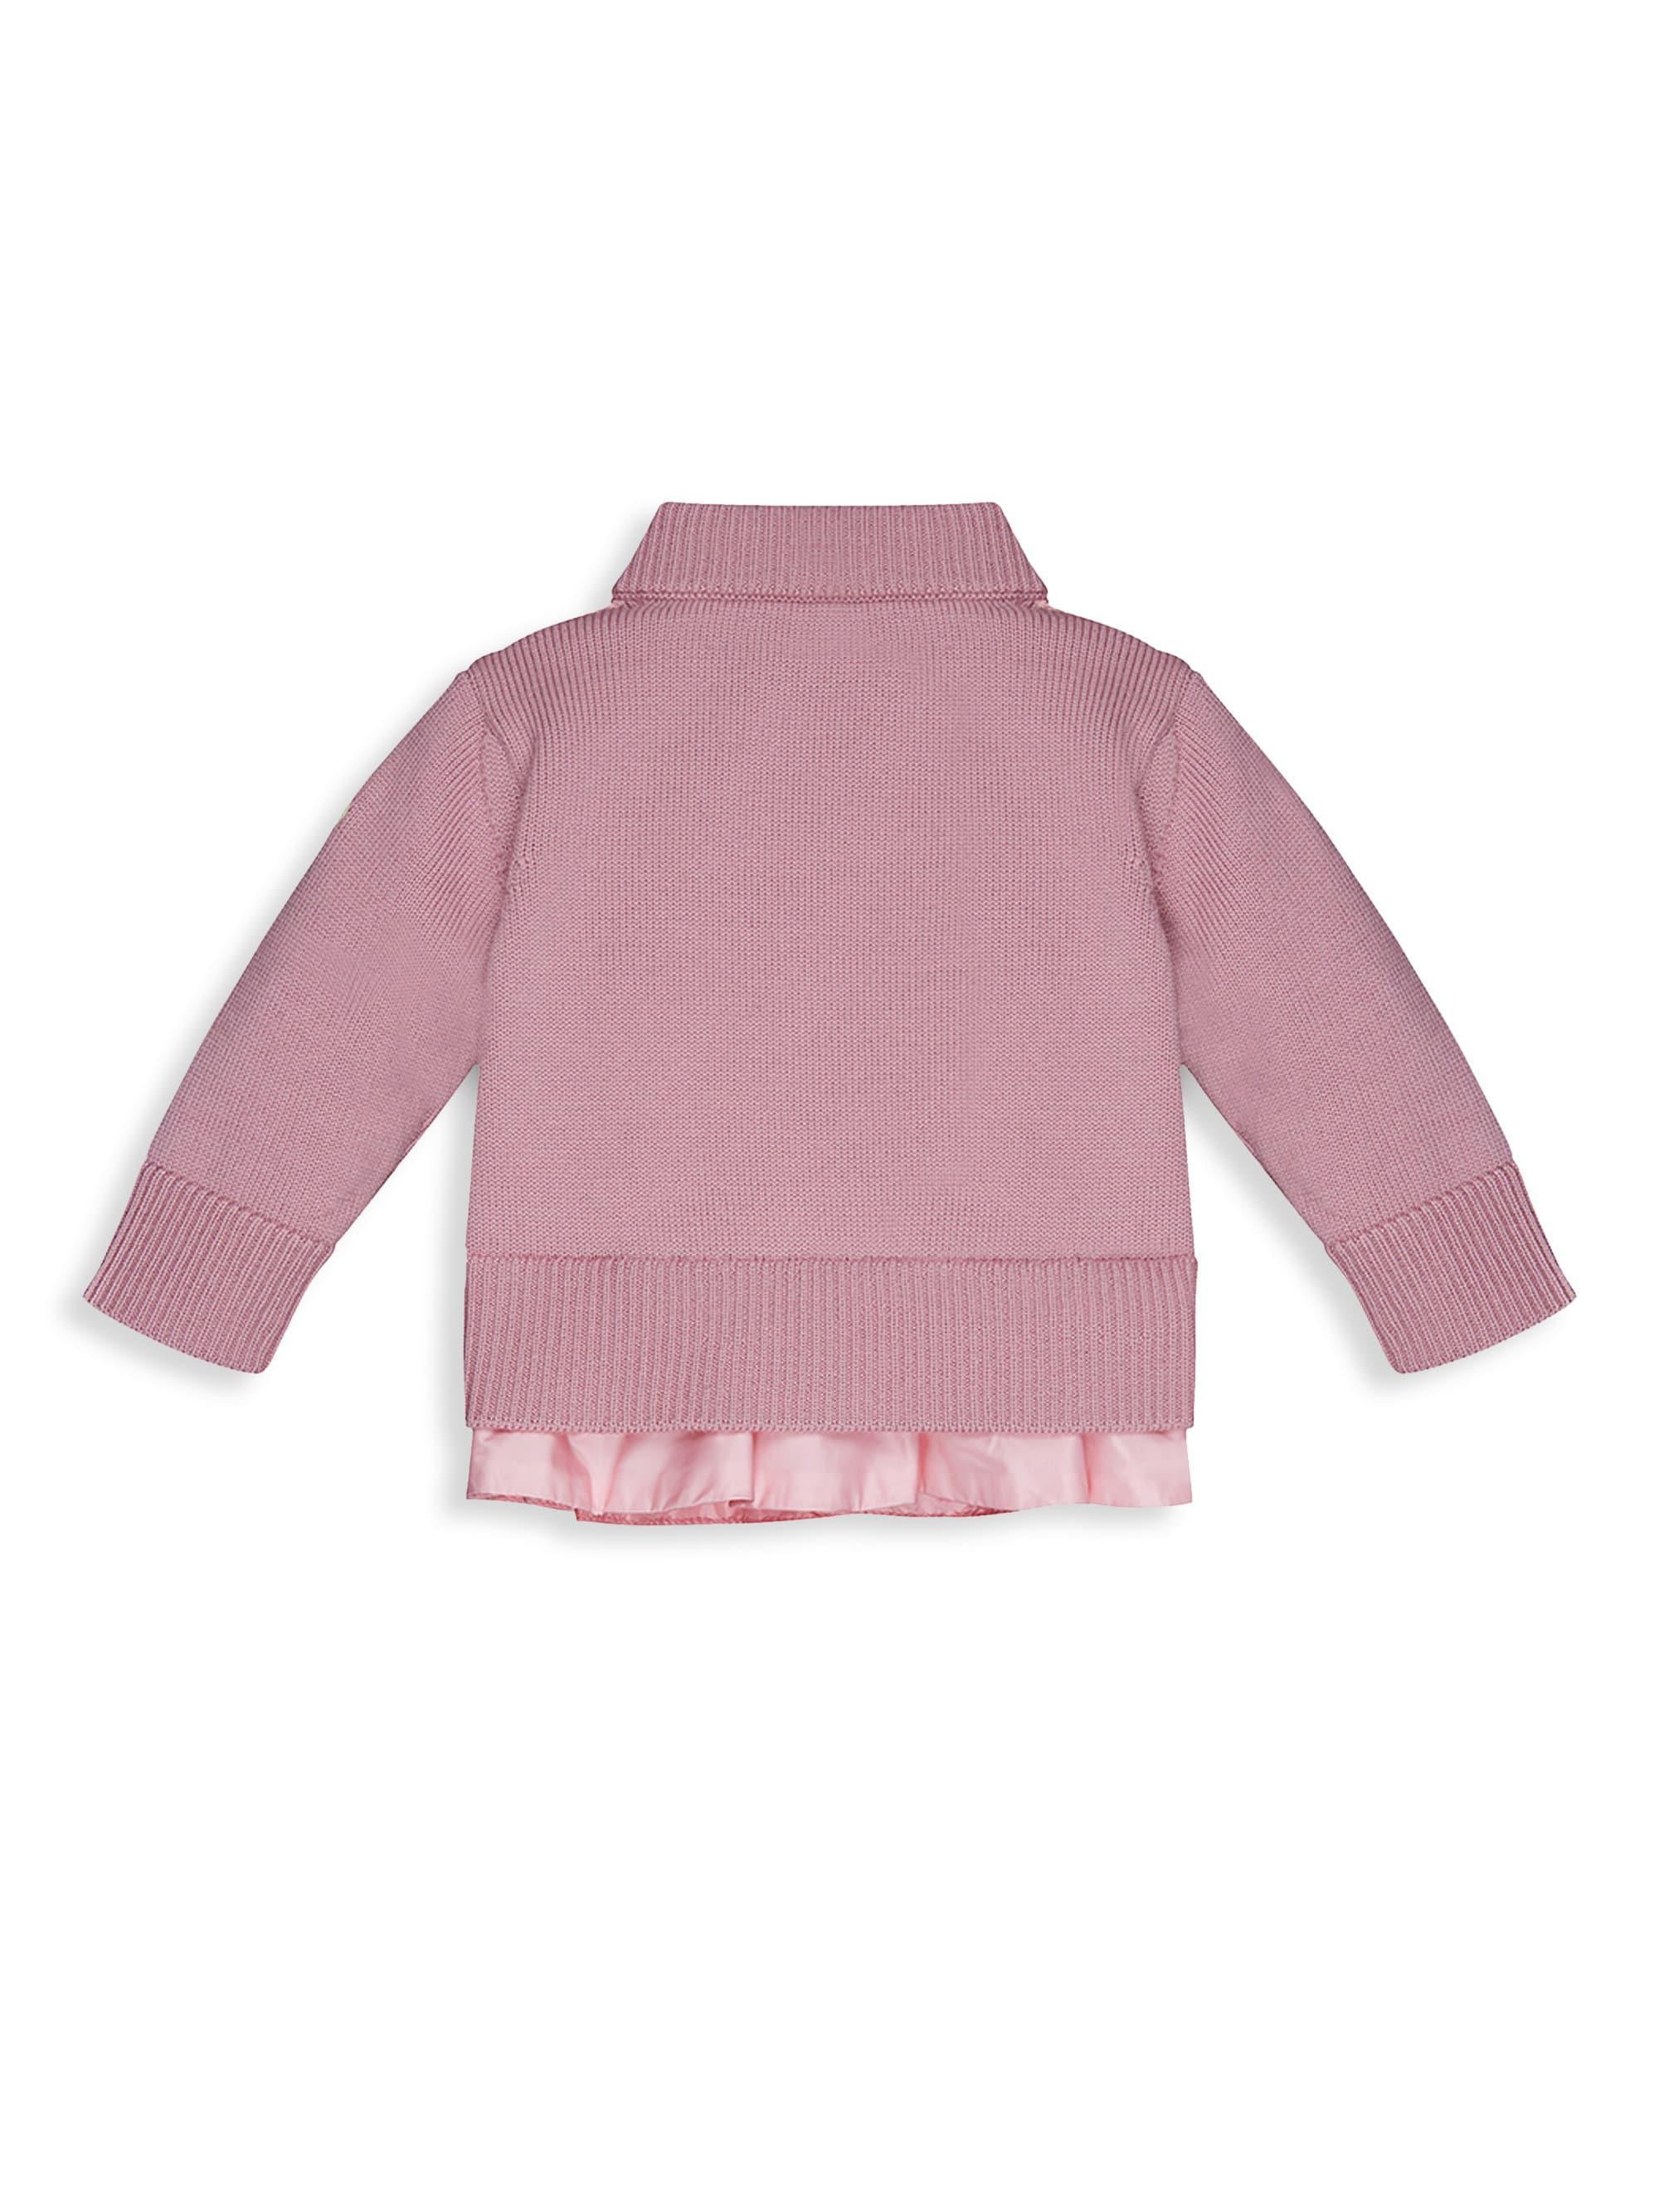 dfb3af6e8c1b Moncler Baby Girl s   Little Girl s Combo Ruffle Hem Jacket in Pink ...